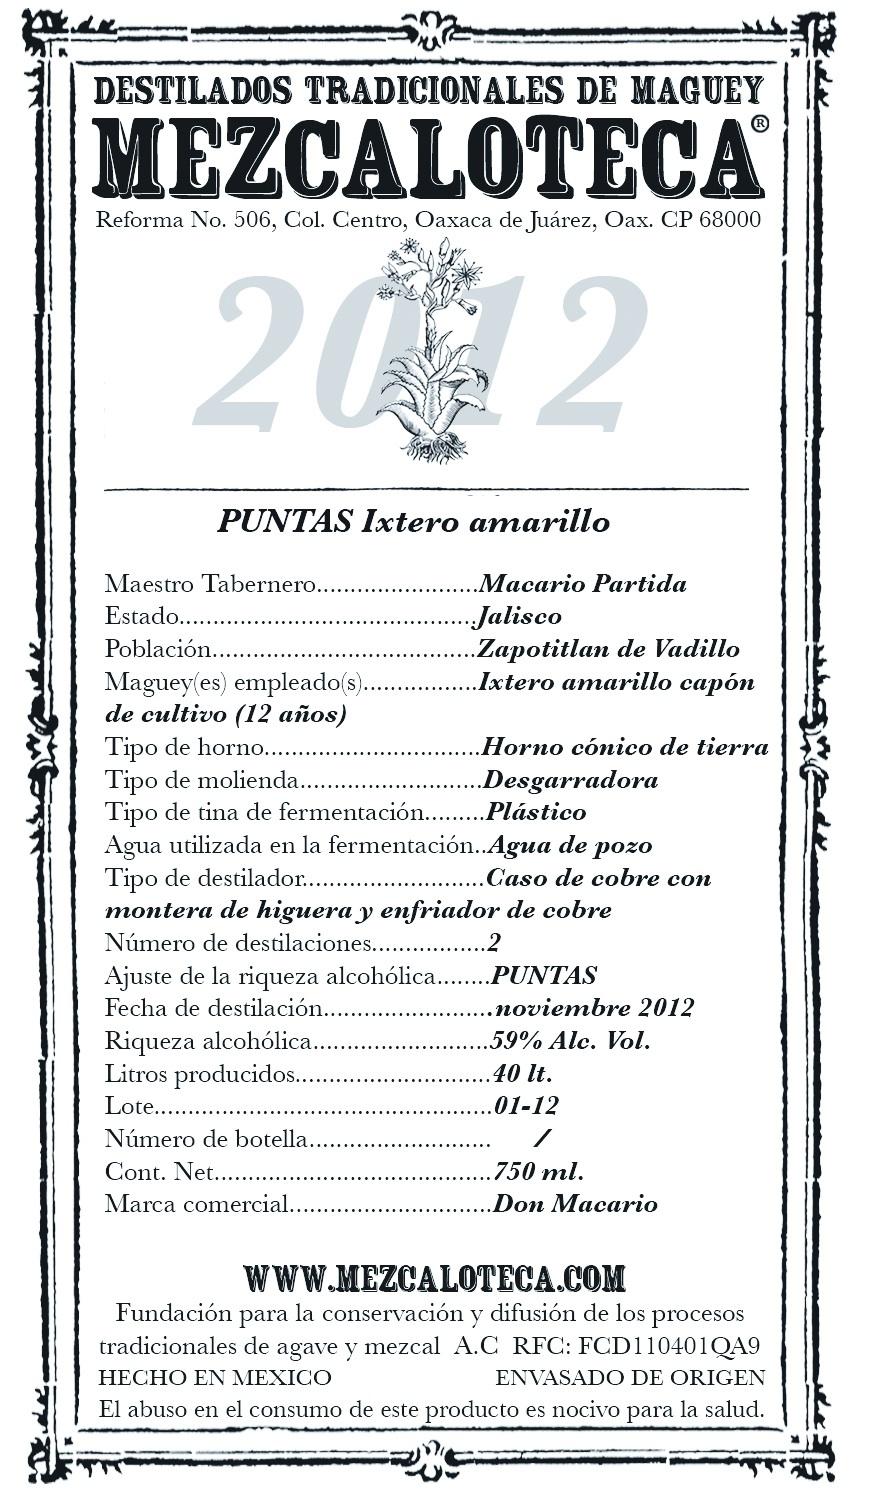 macario.puntas.ixteroA.2012[1] web.jpg